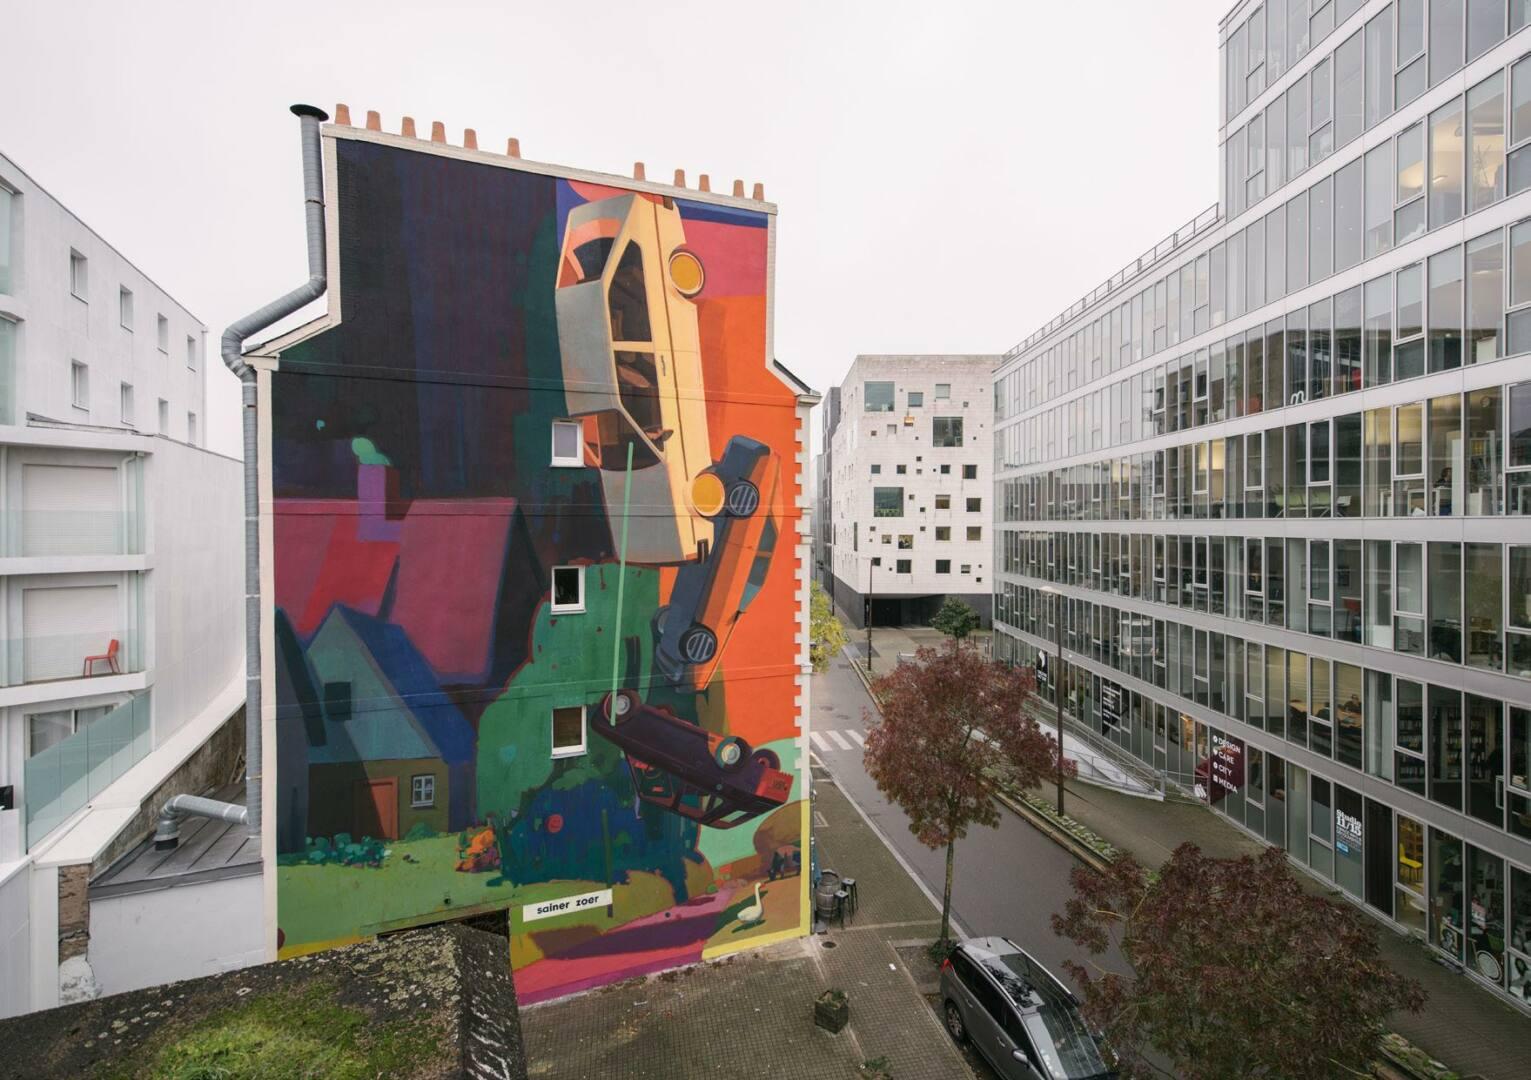 DEHORS ! AVEC LA BIENNALE D'ART URBAIN TEENAGE KICKS